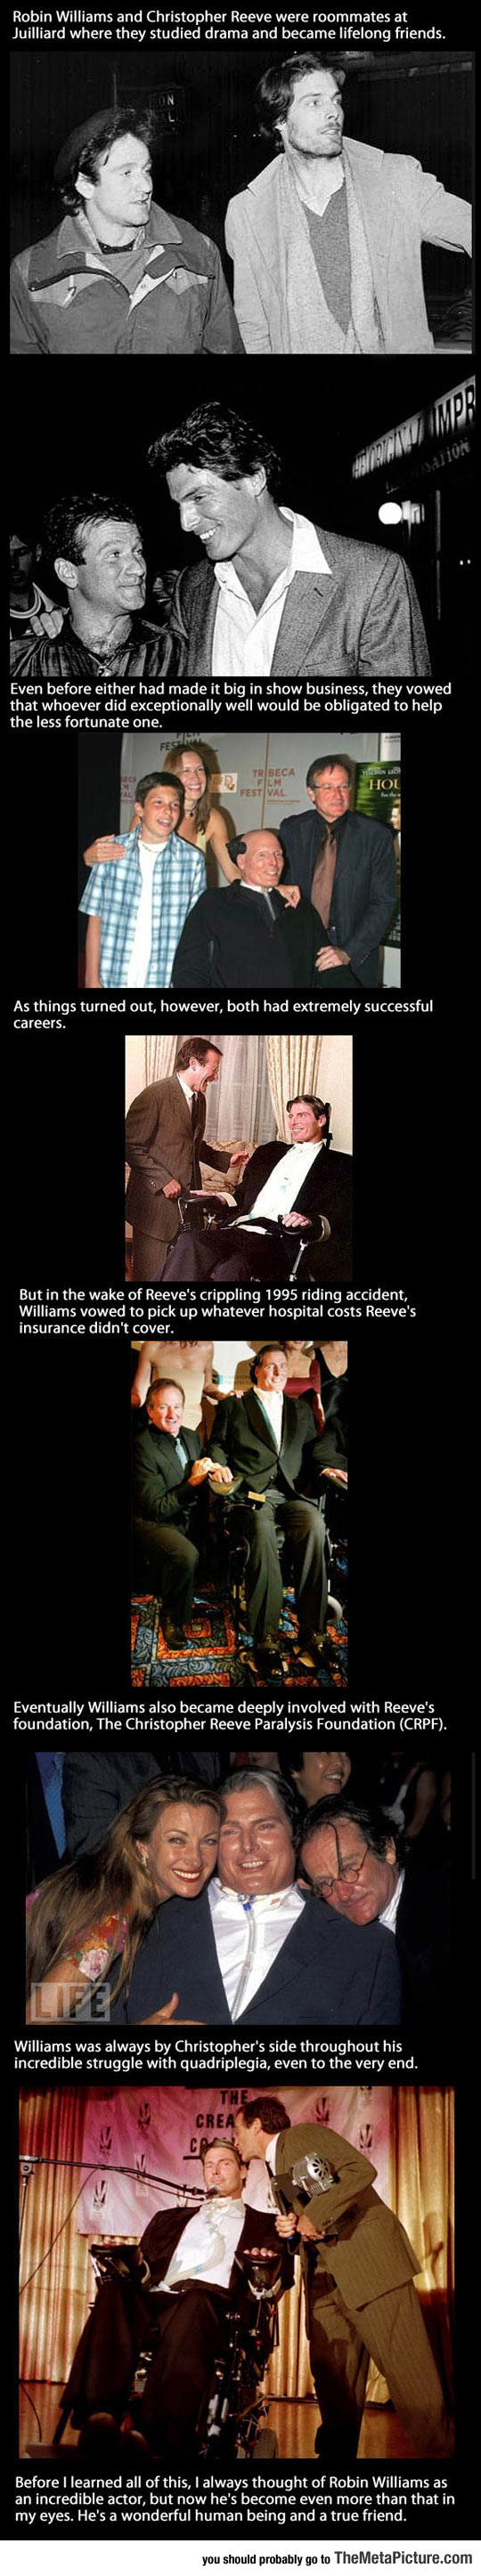 Robin Williams Was A True Best Friend